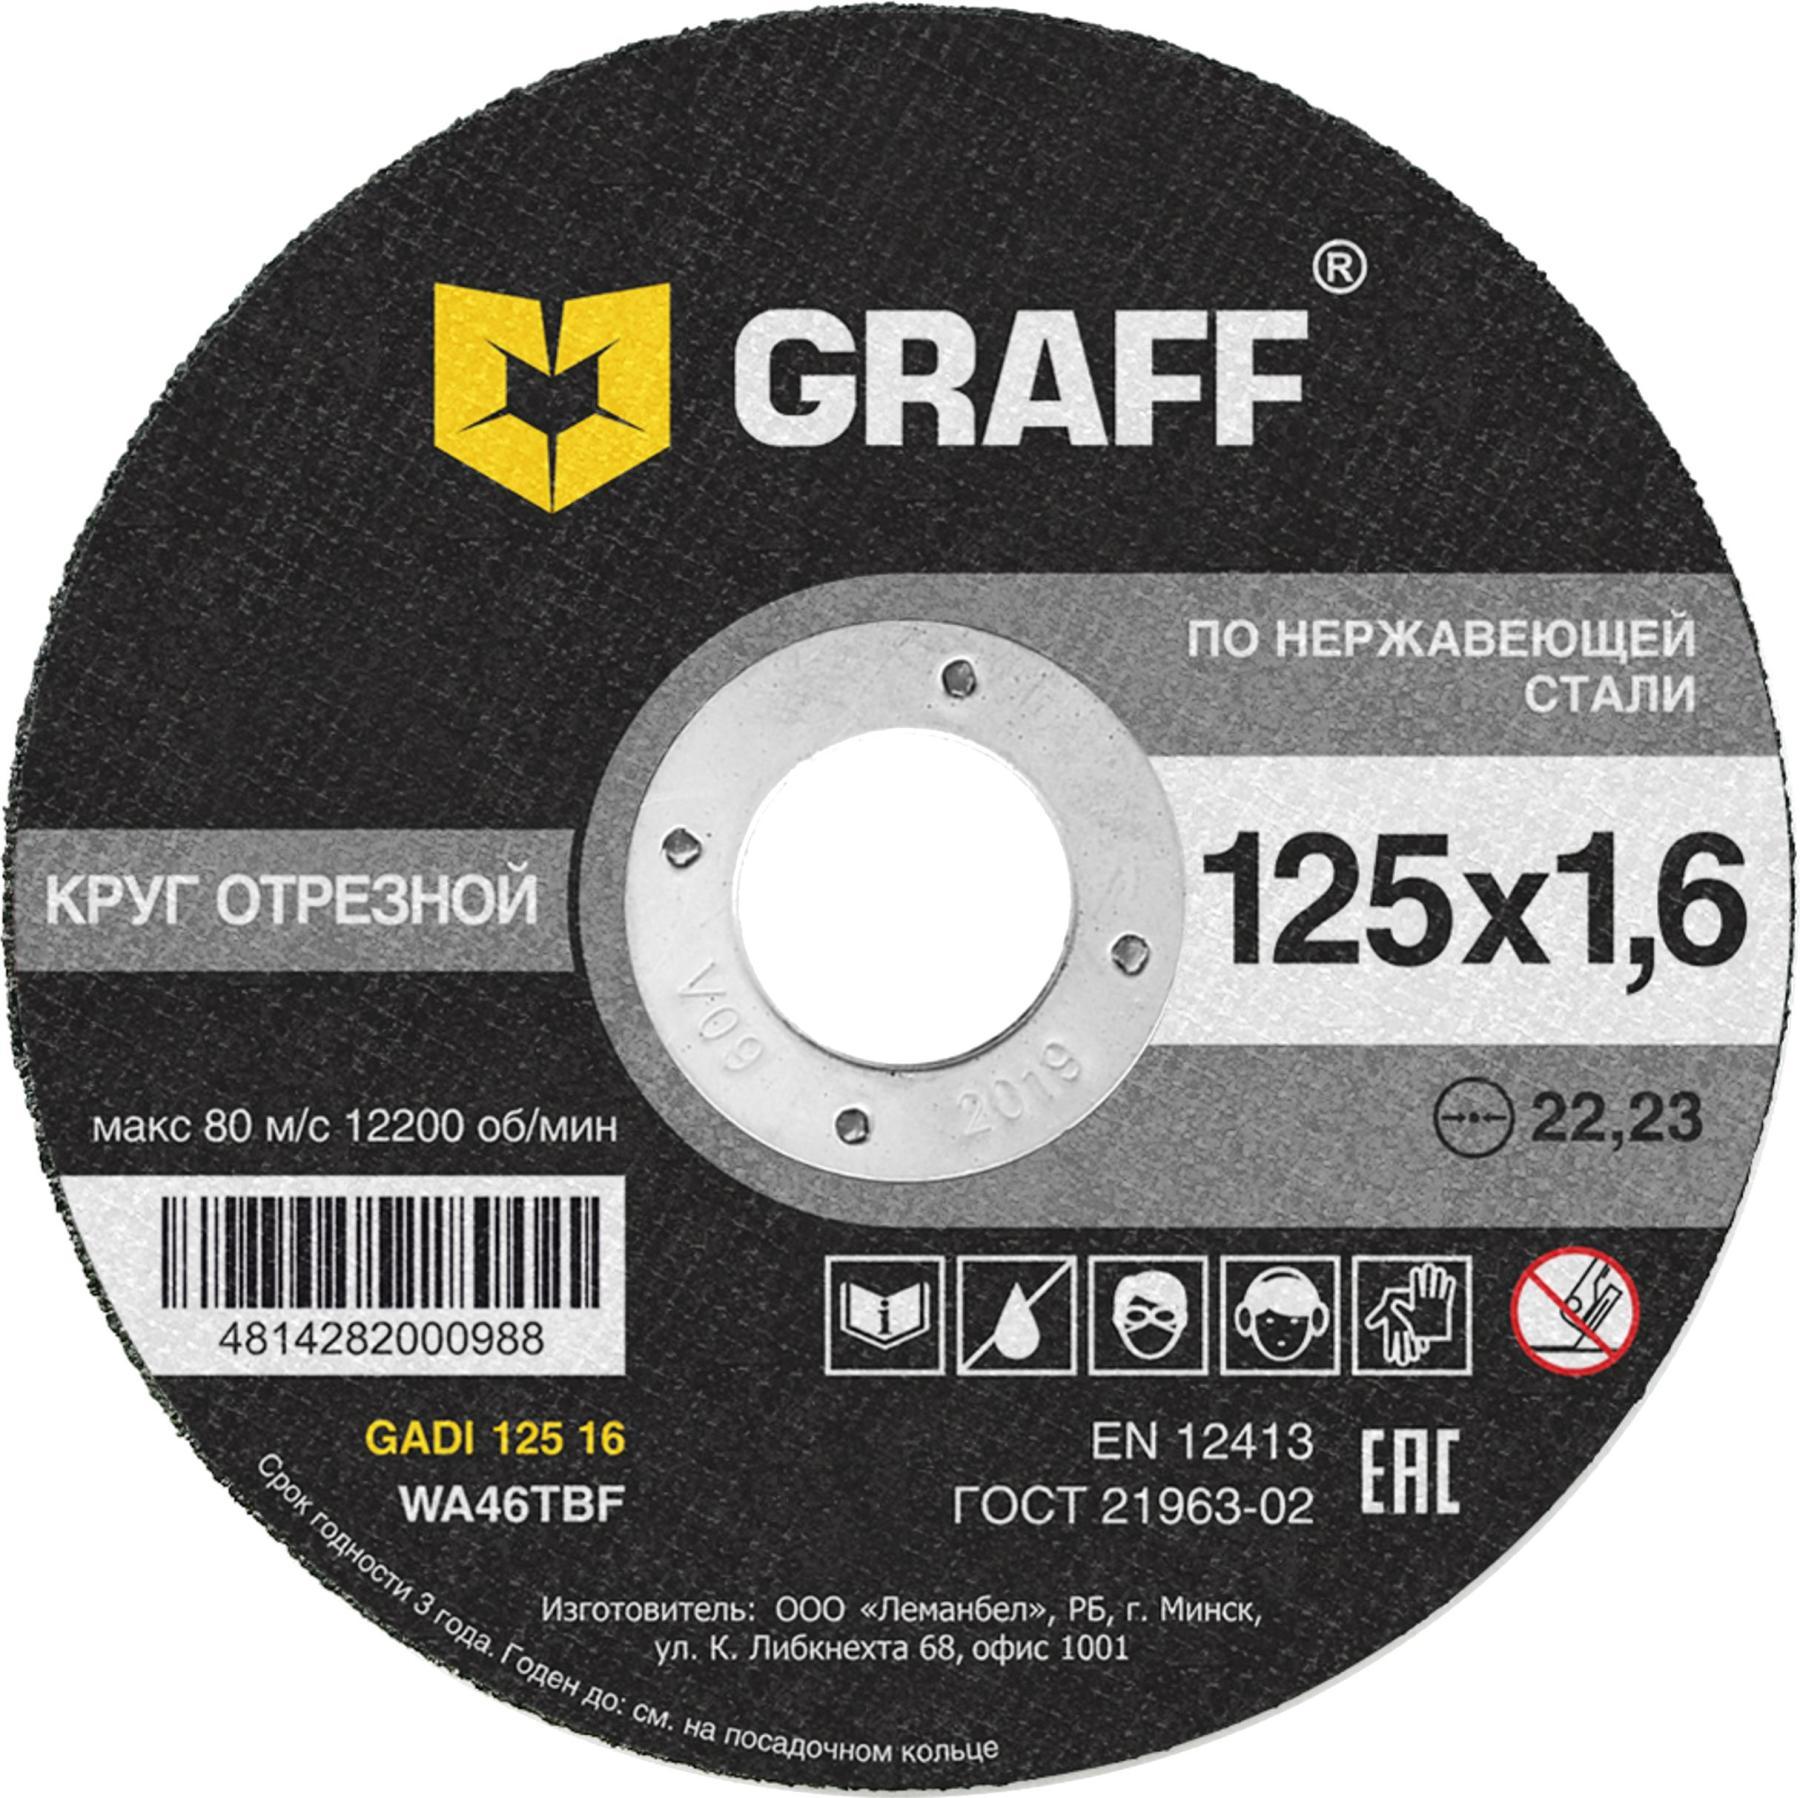 Circle Cutting GRAFF GADI 125 16